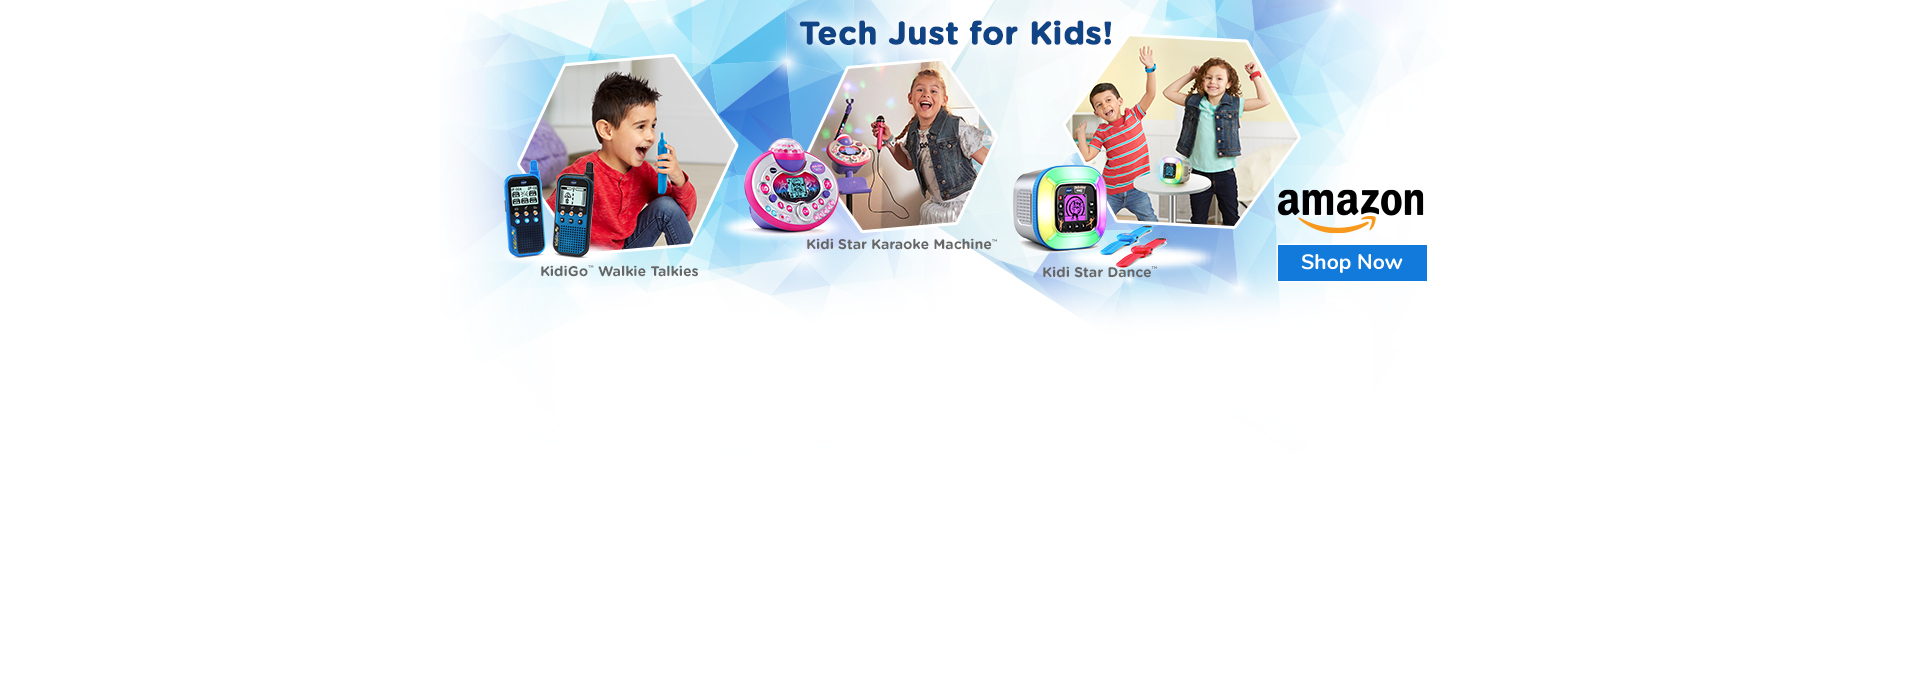 Check out VTech Kid Tech Toys:  KidiGo Walkie Talkies Kidi Star Dance and Kidi Star Karaoke Machine